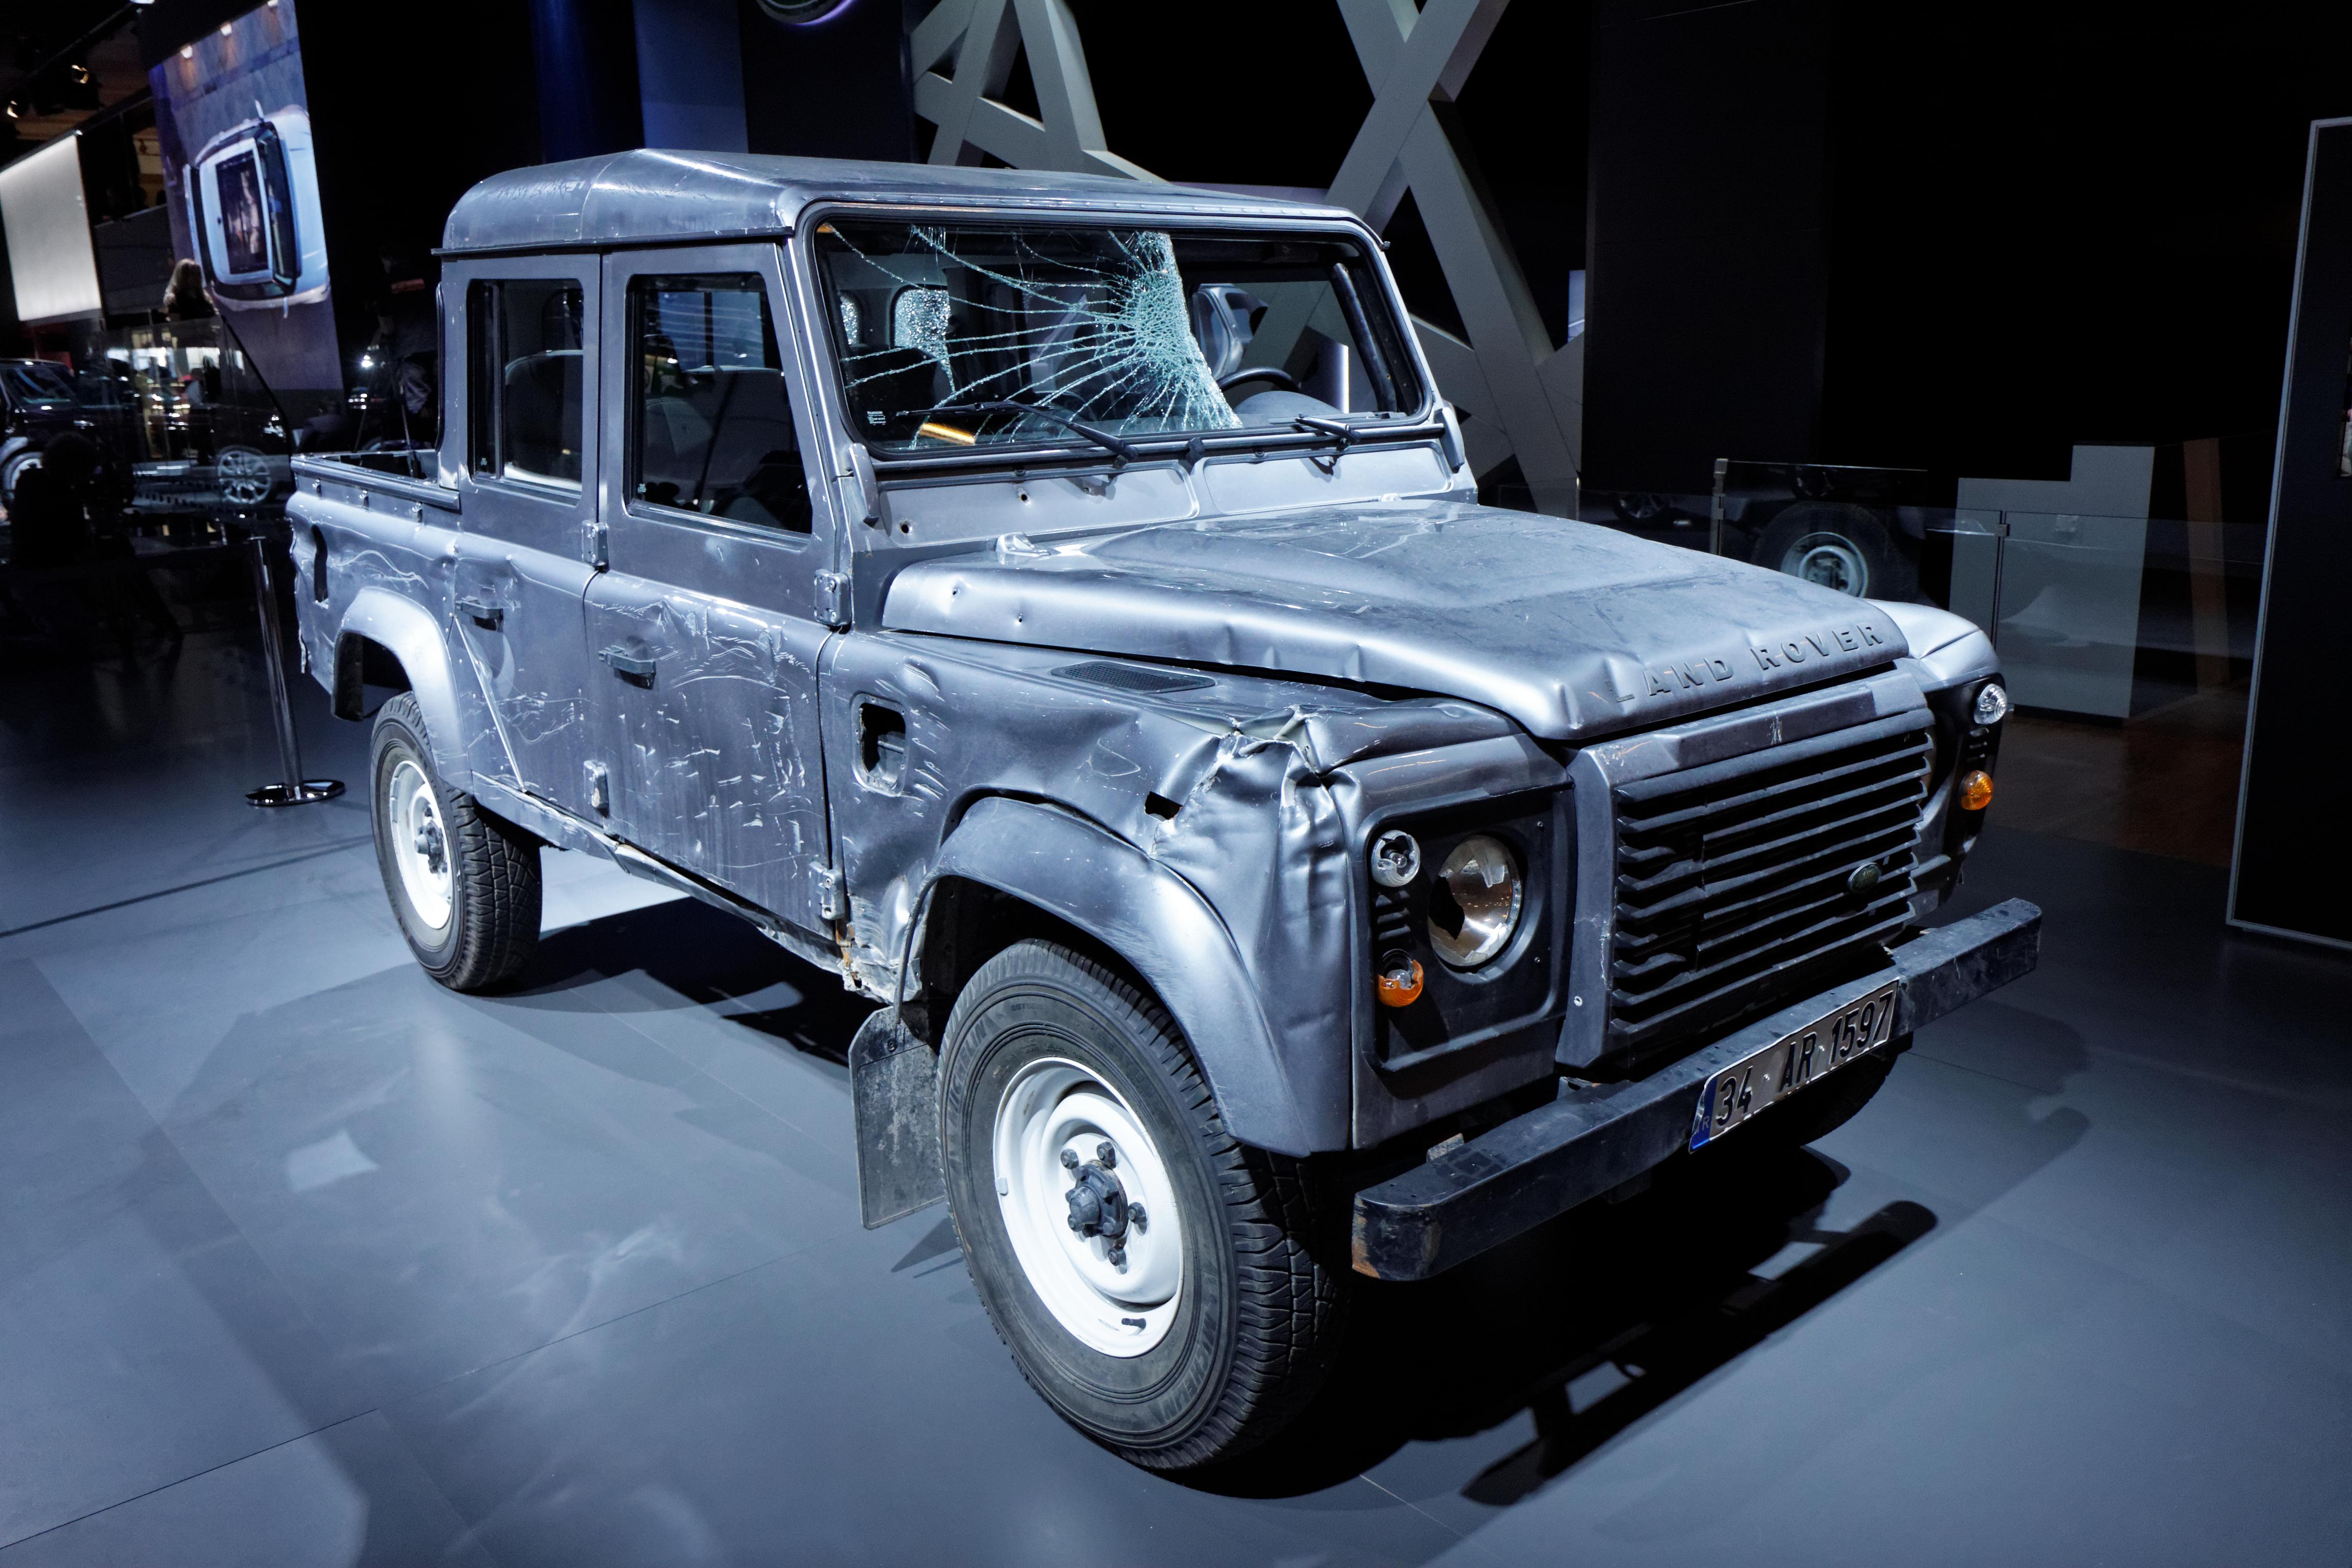 file:land rover defender double cab pick-up - skyfall - mondial de l